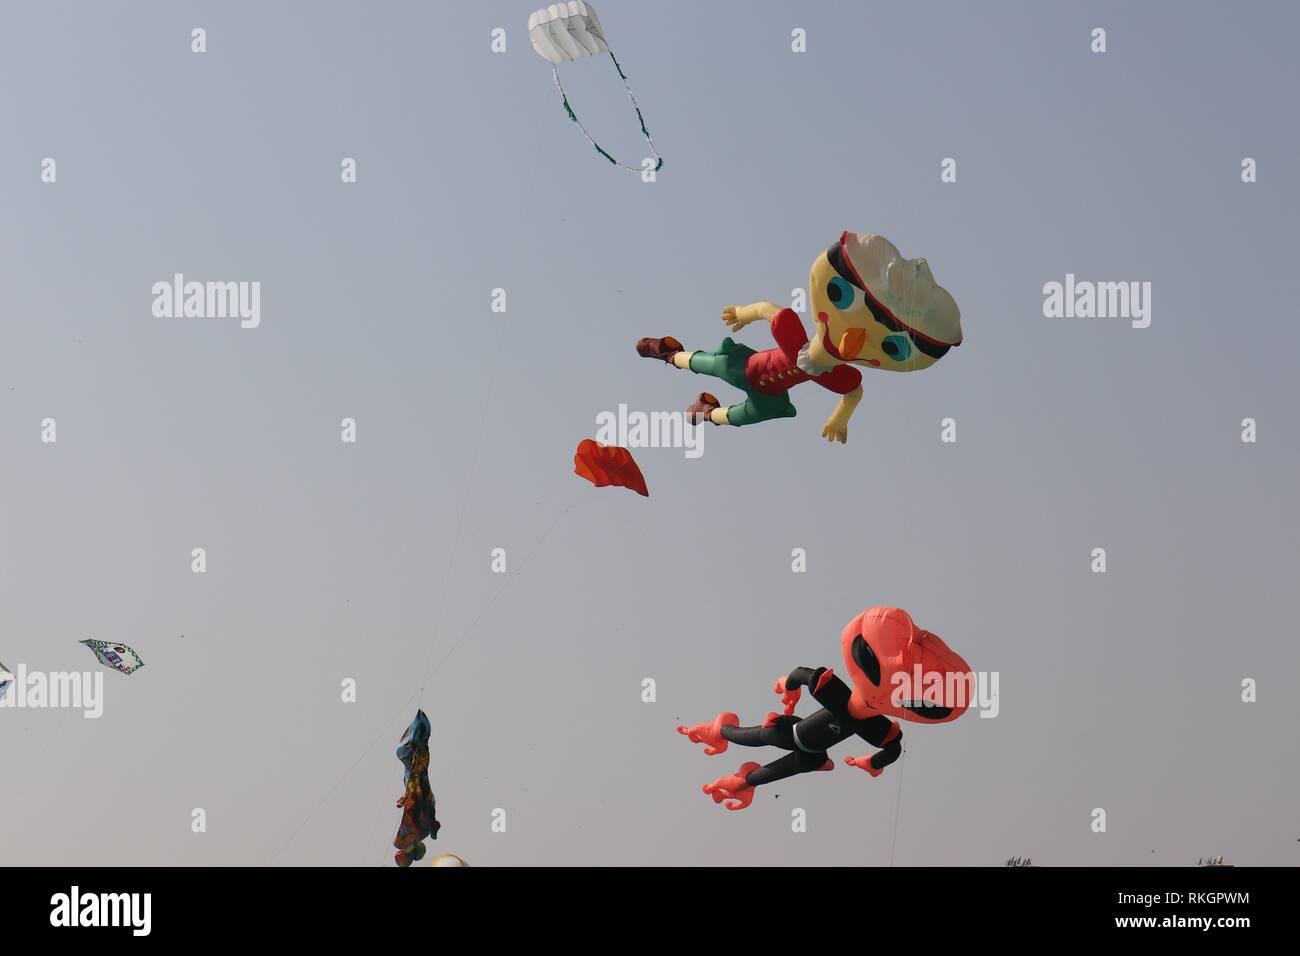 International Kite Festival-2019, Ahmedabad-India - Stock Image